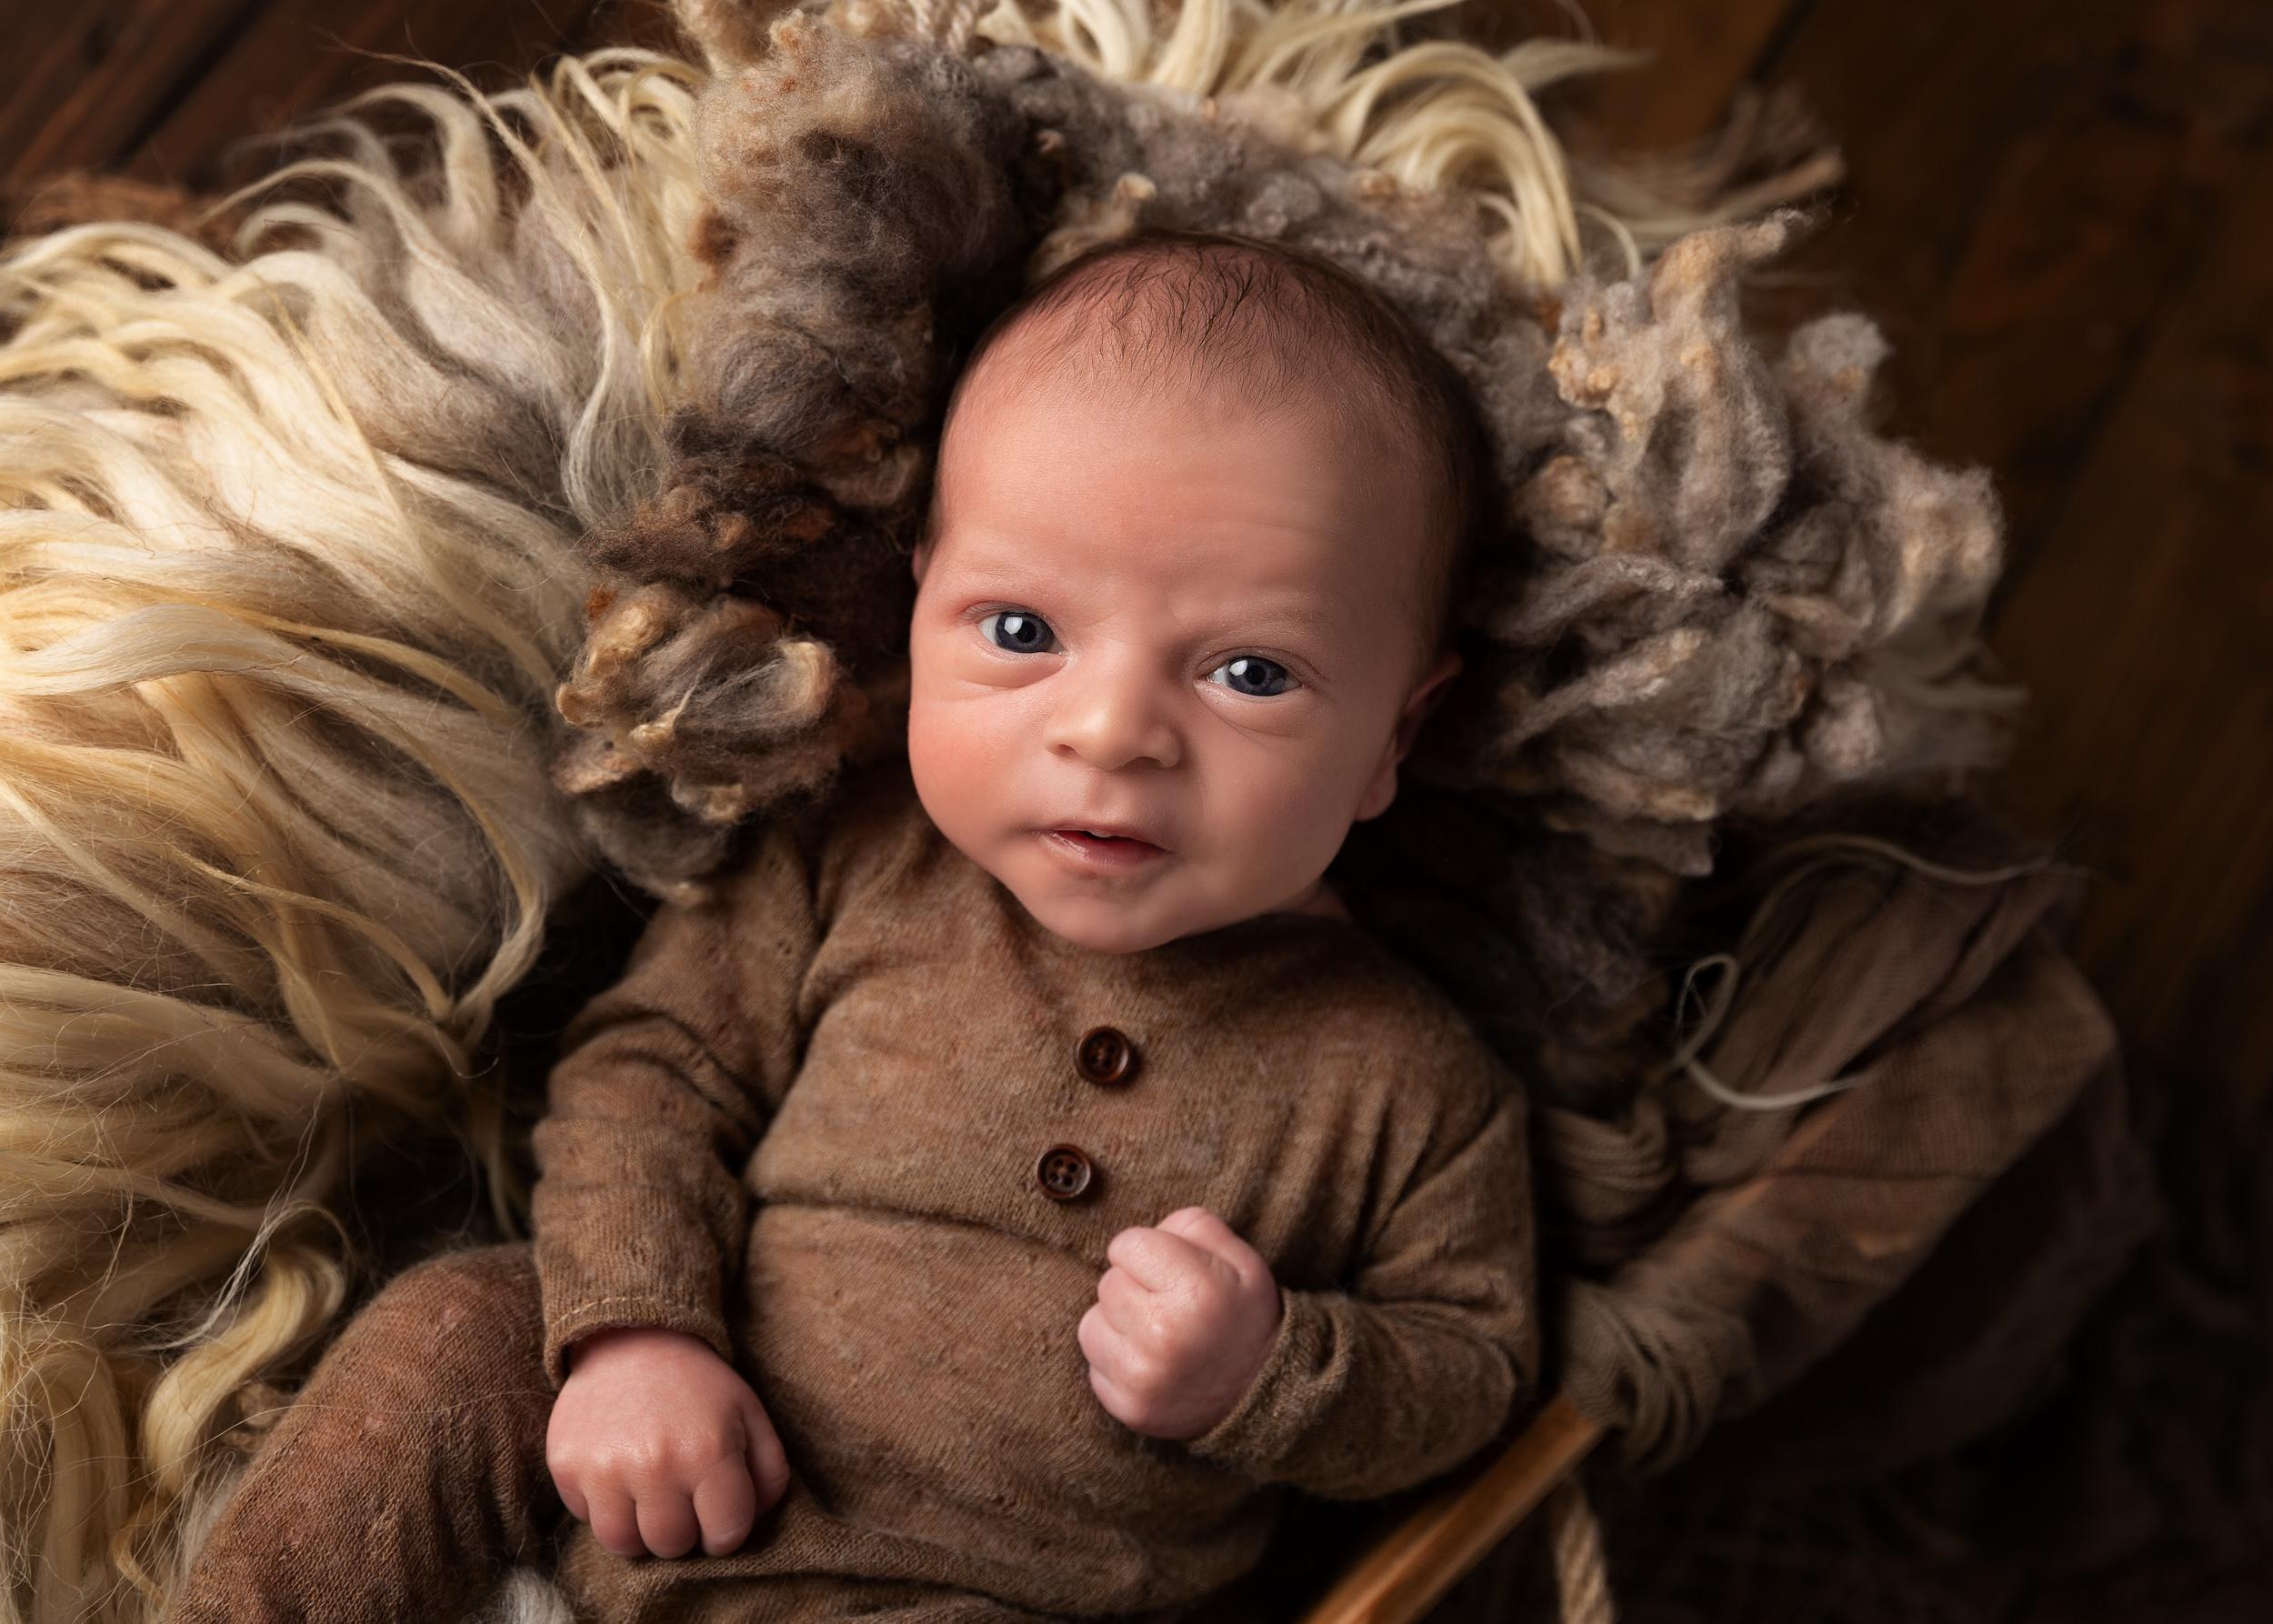 Awake baby staring right into the camera by Cheshire newborn photographer in Sandbach